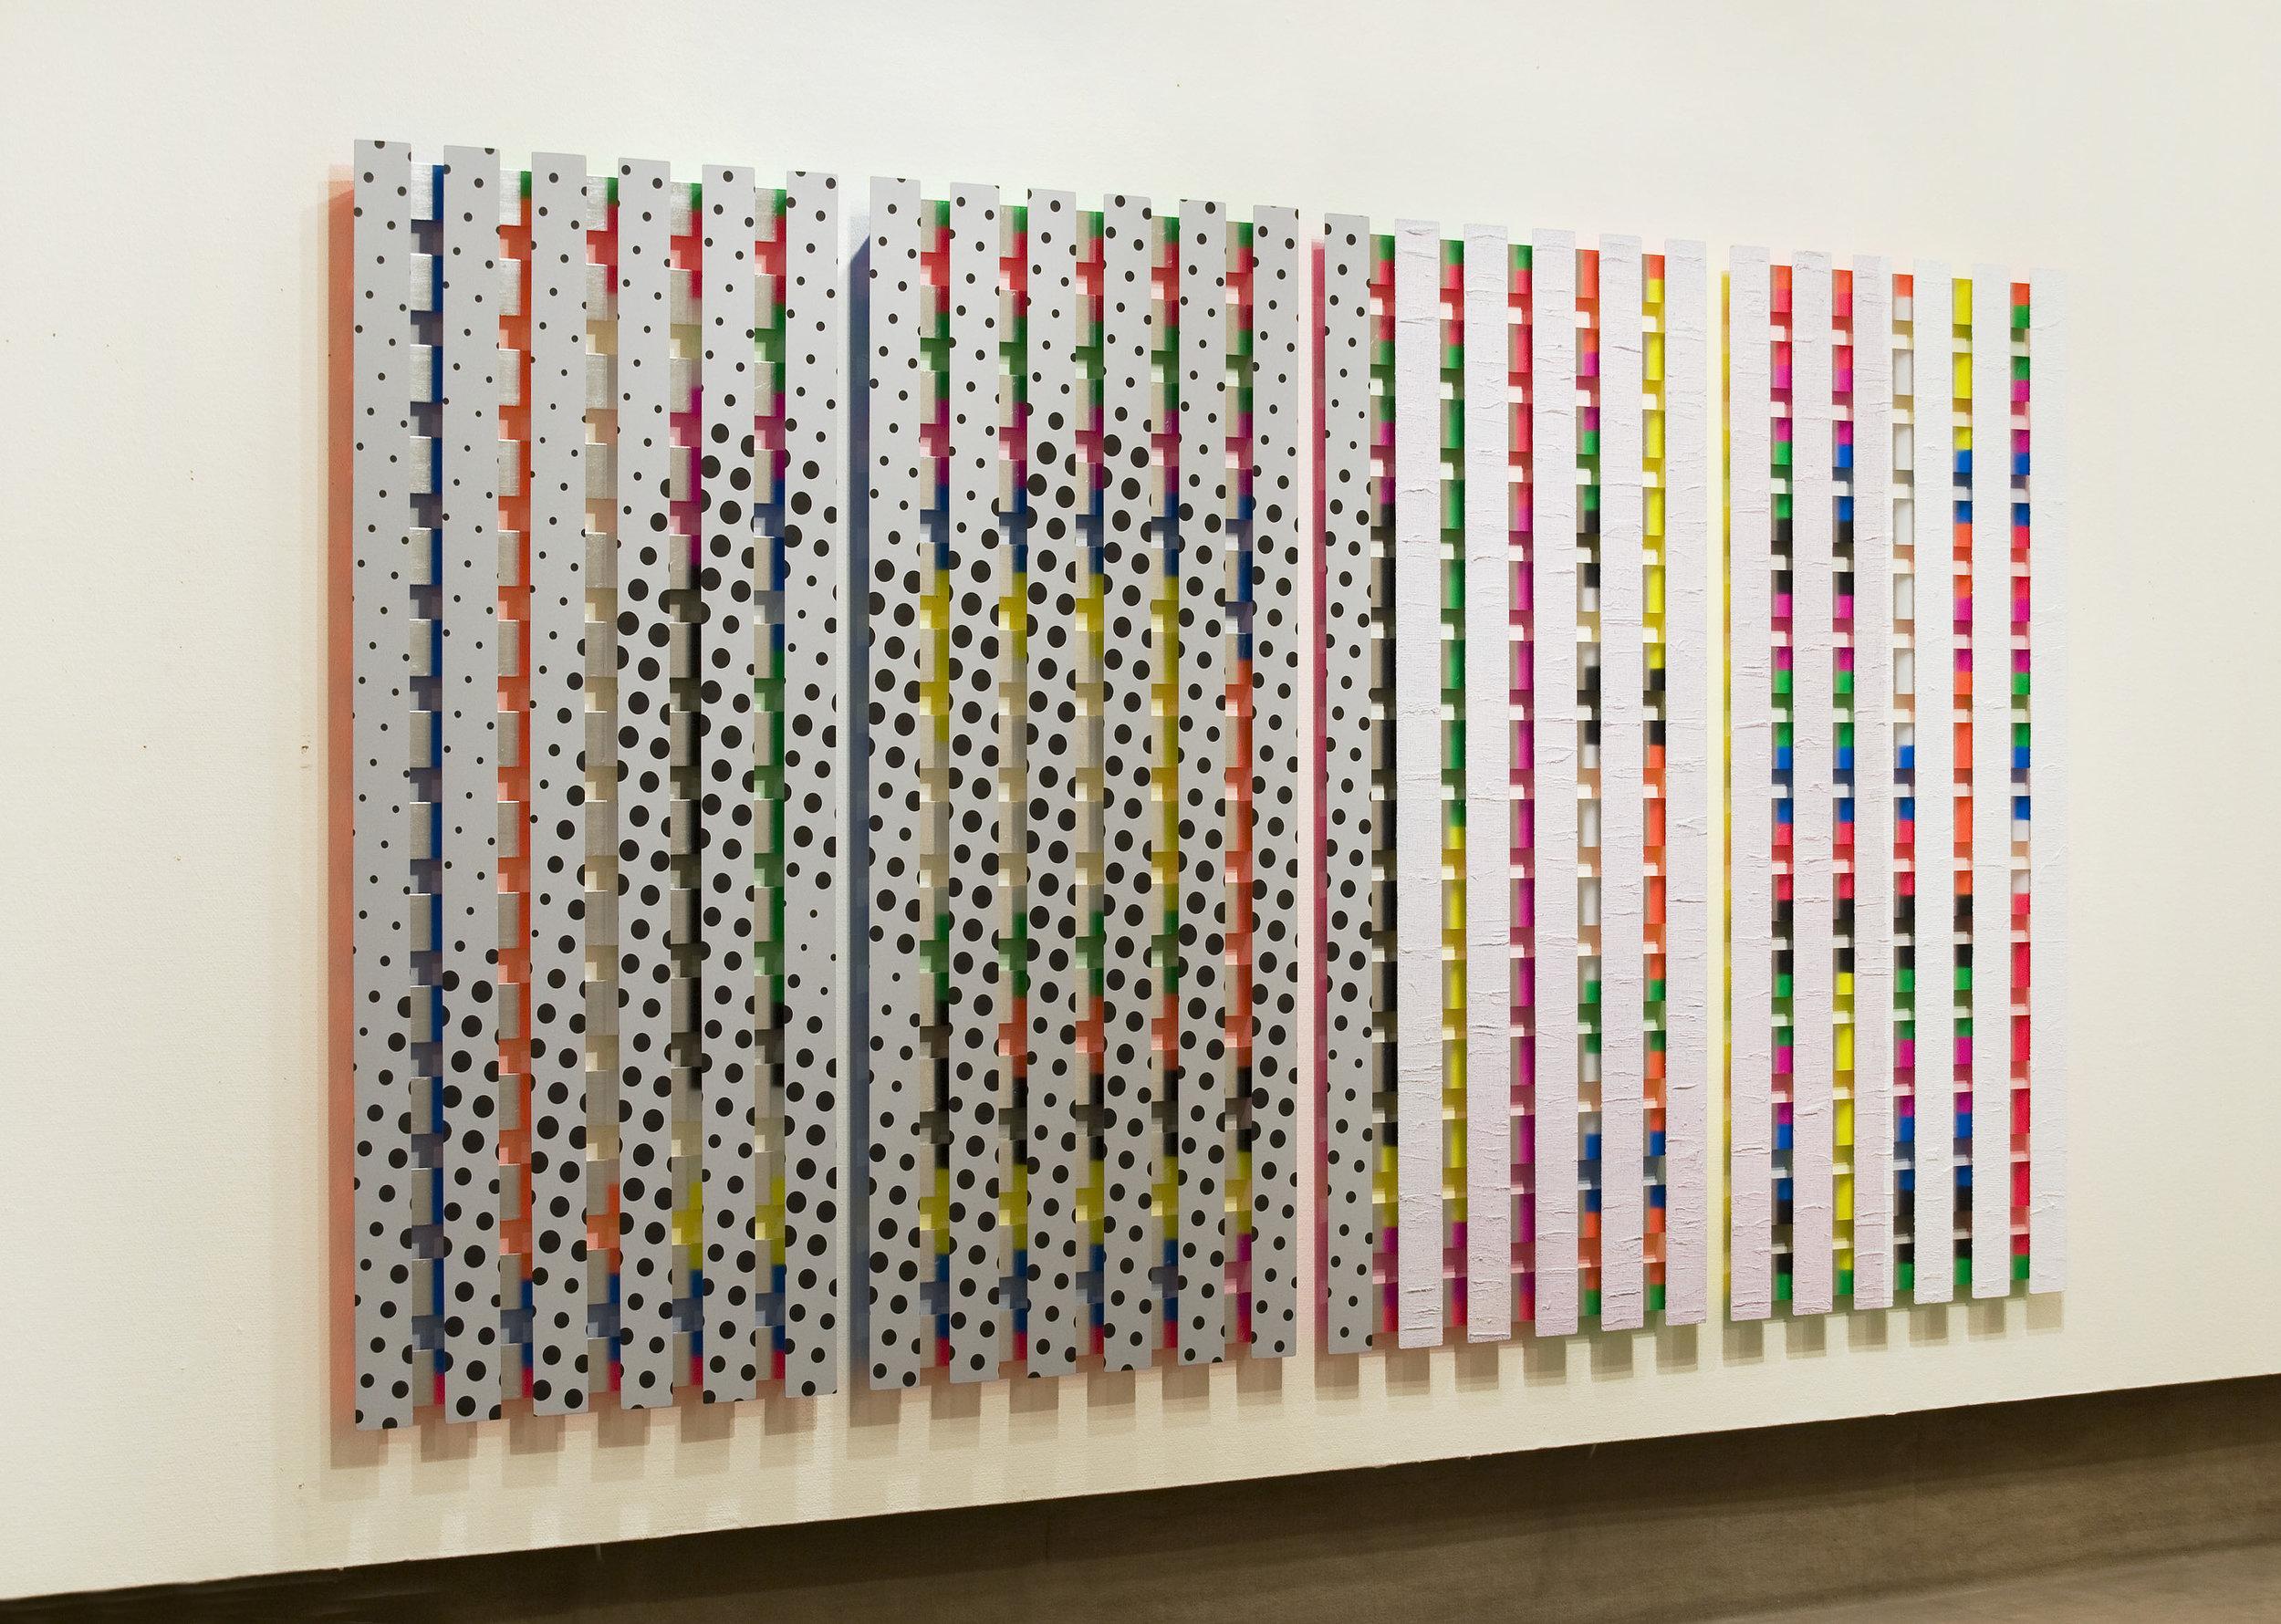 3j akril, les, 186 x 335 cm, 2010.jpg